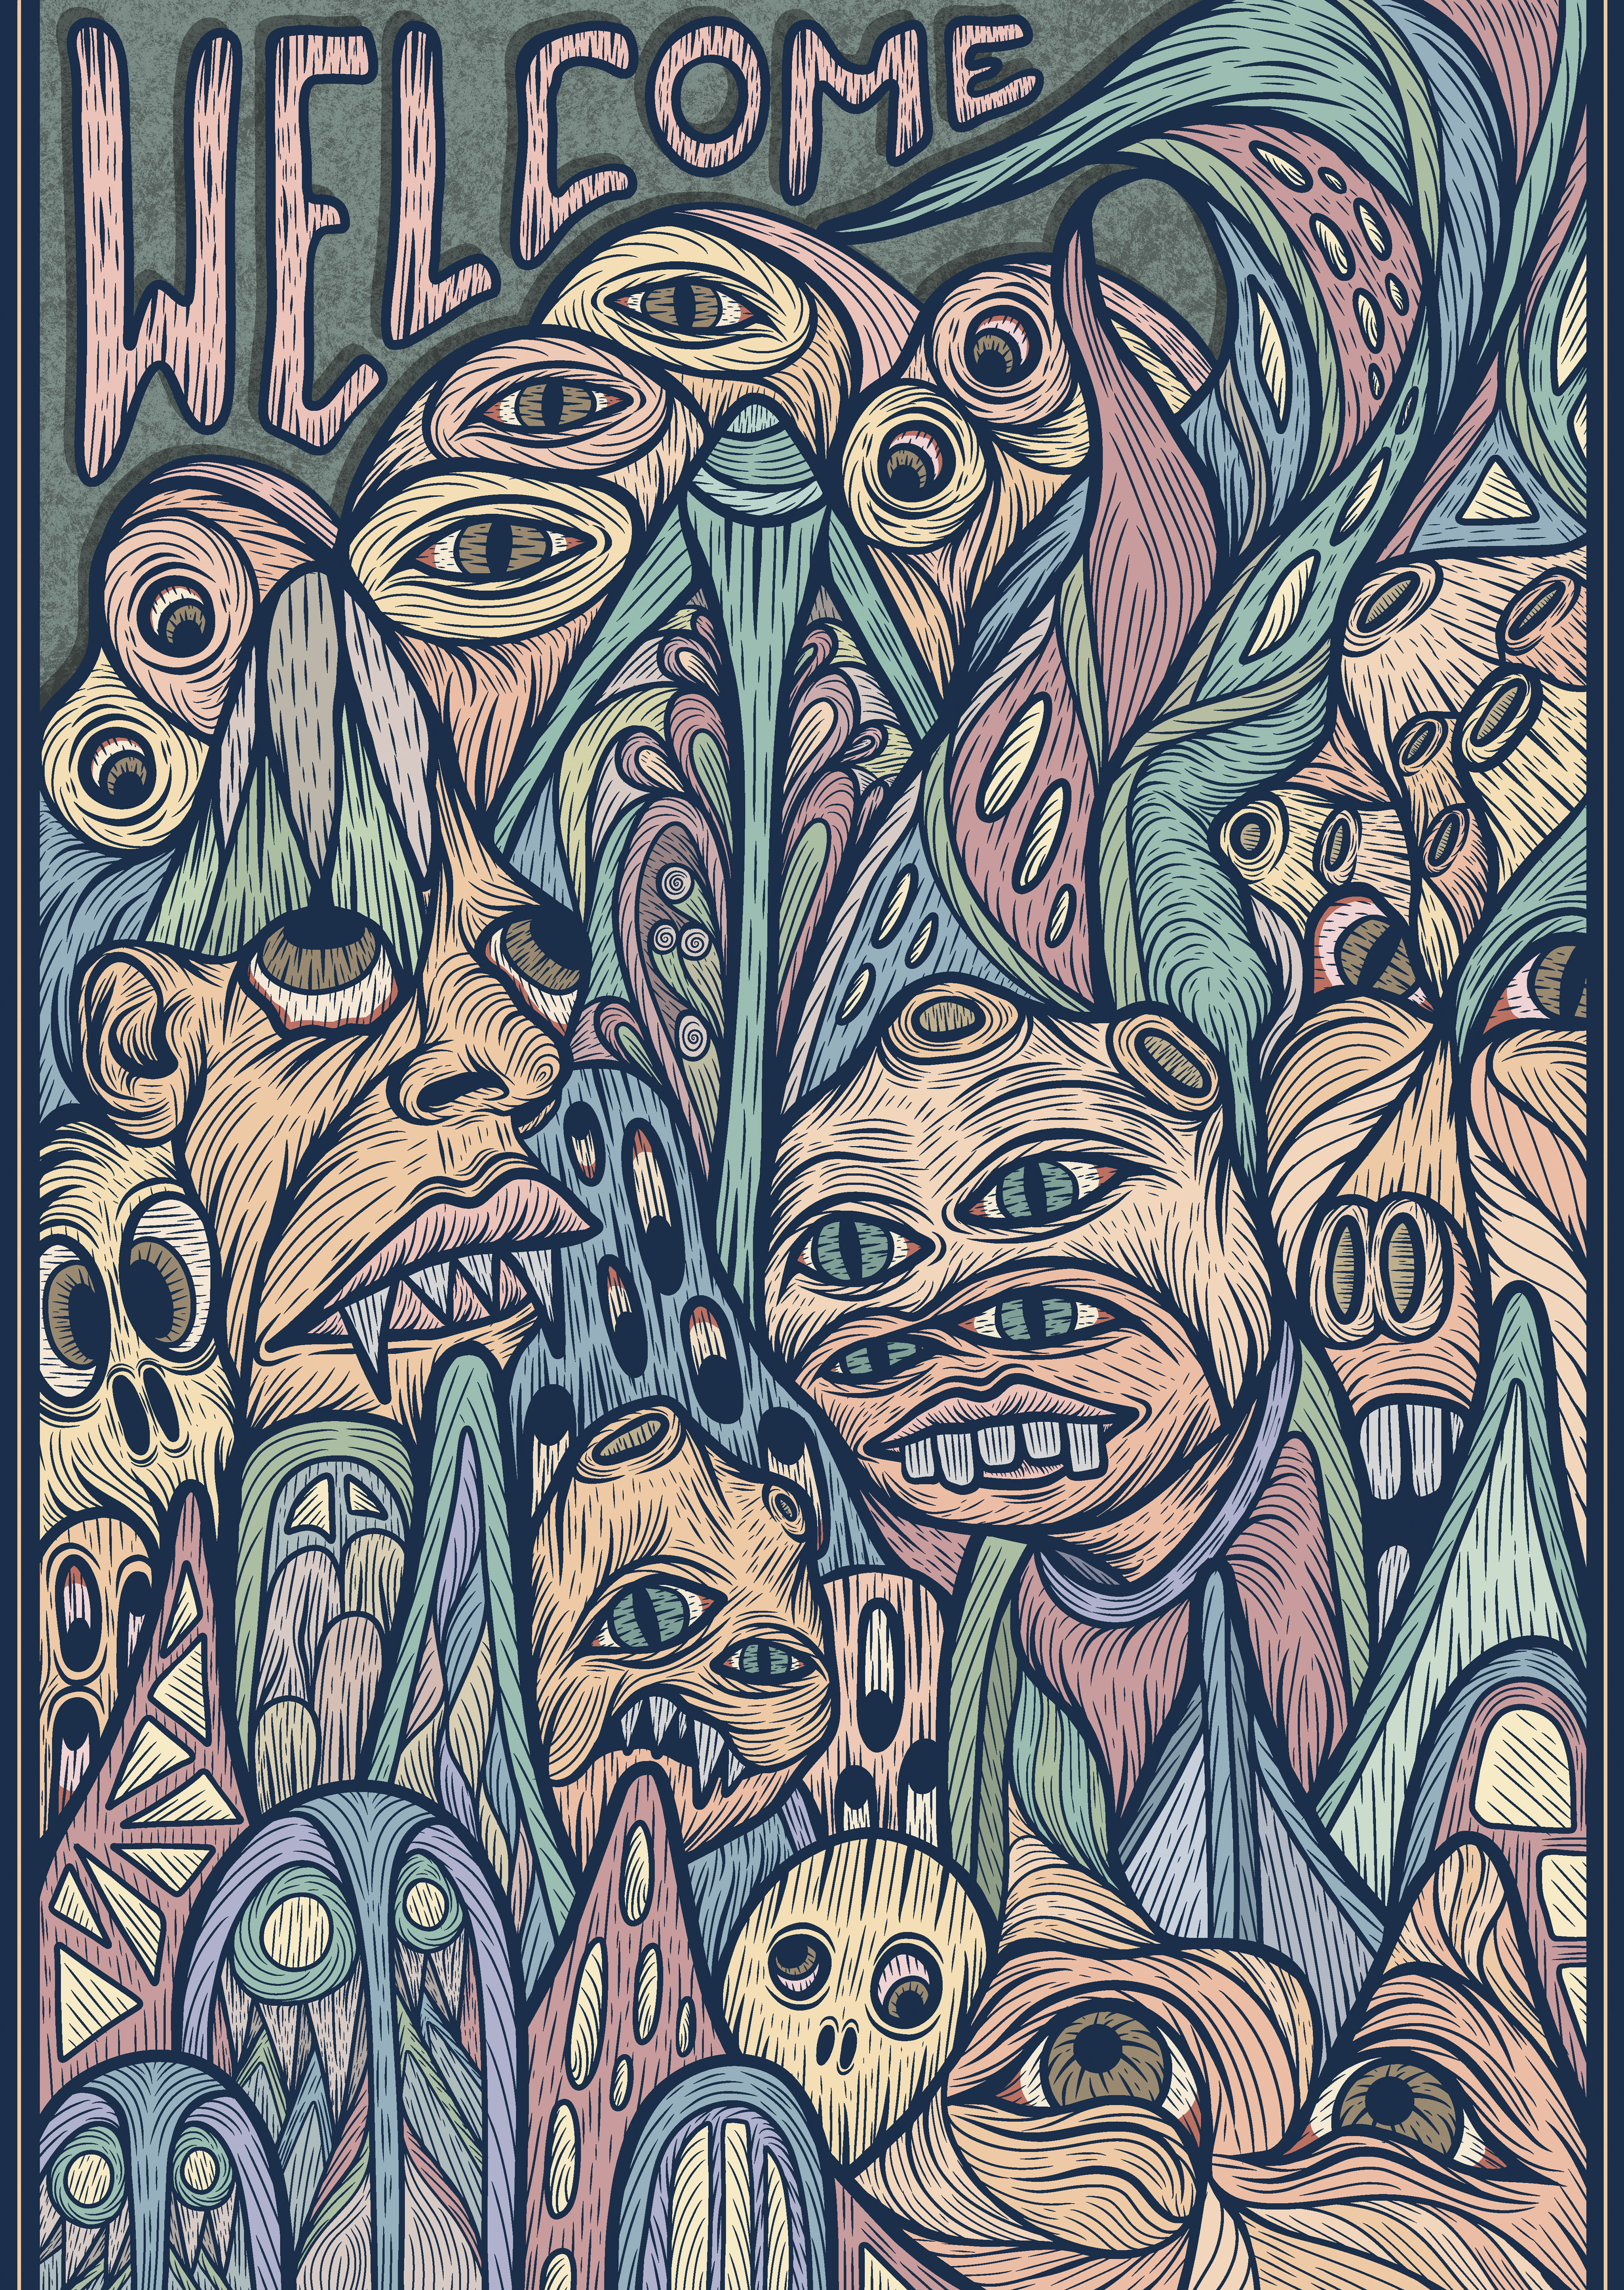 Illustrator Ade Milhad